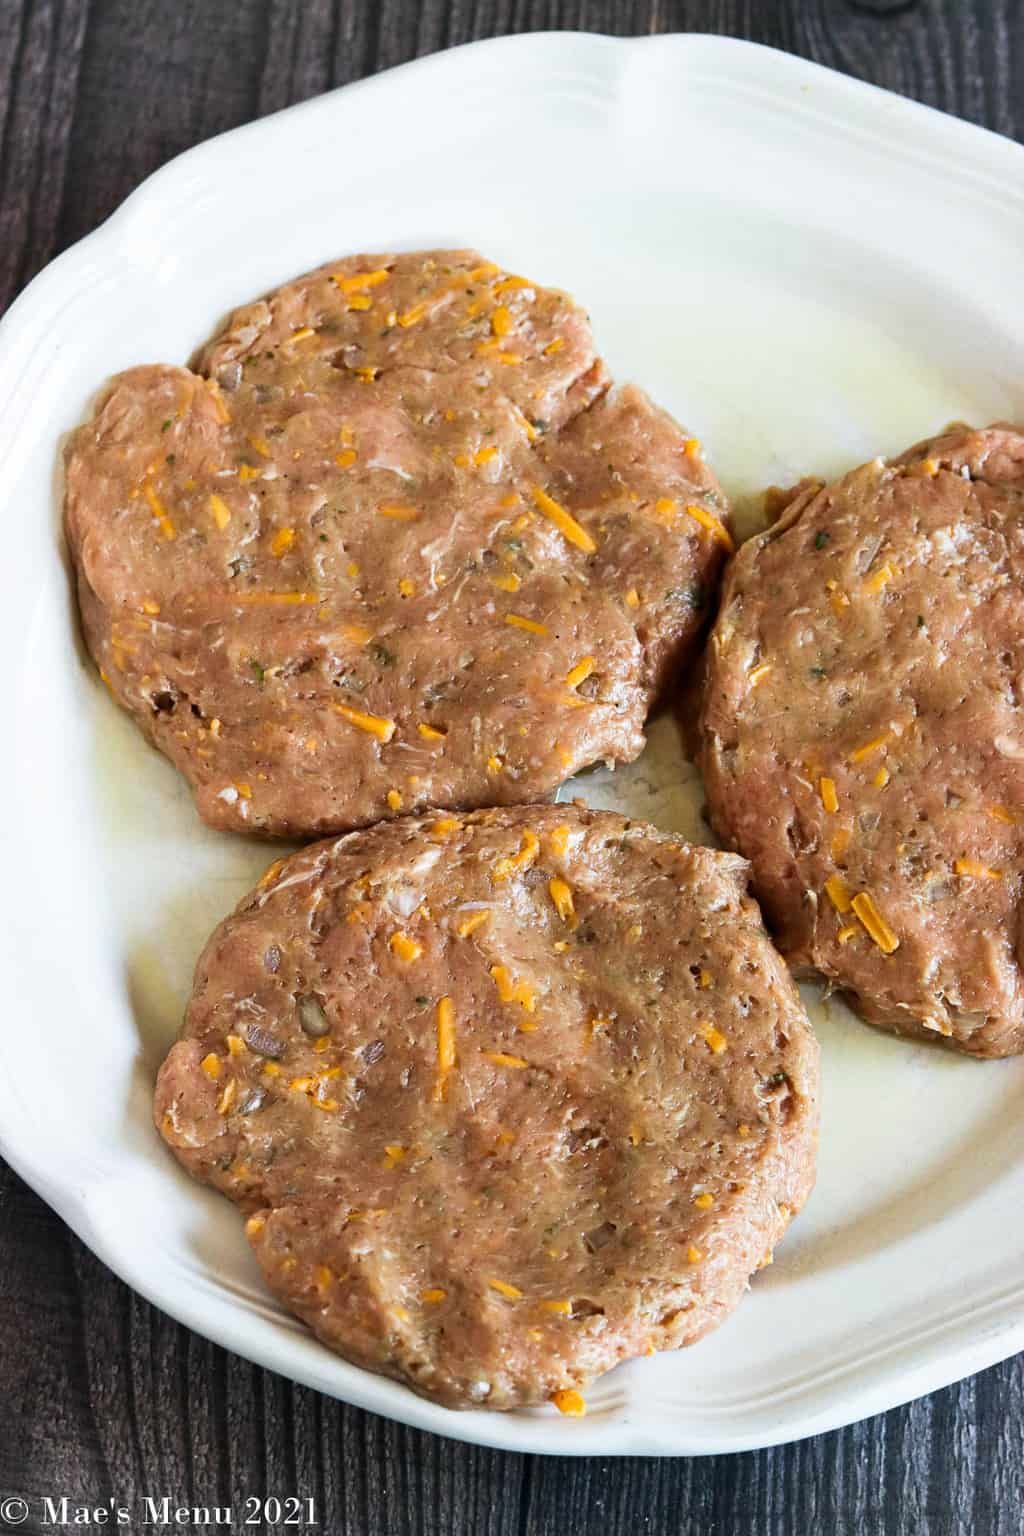 Turkey burger patties on a white dinner plate